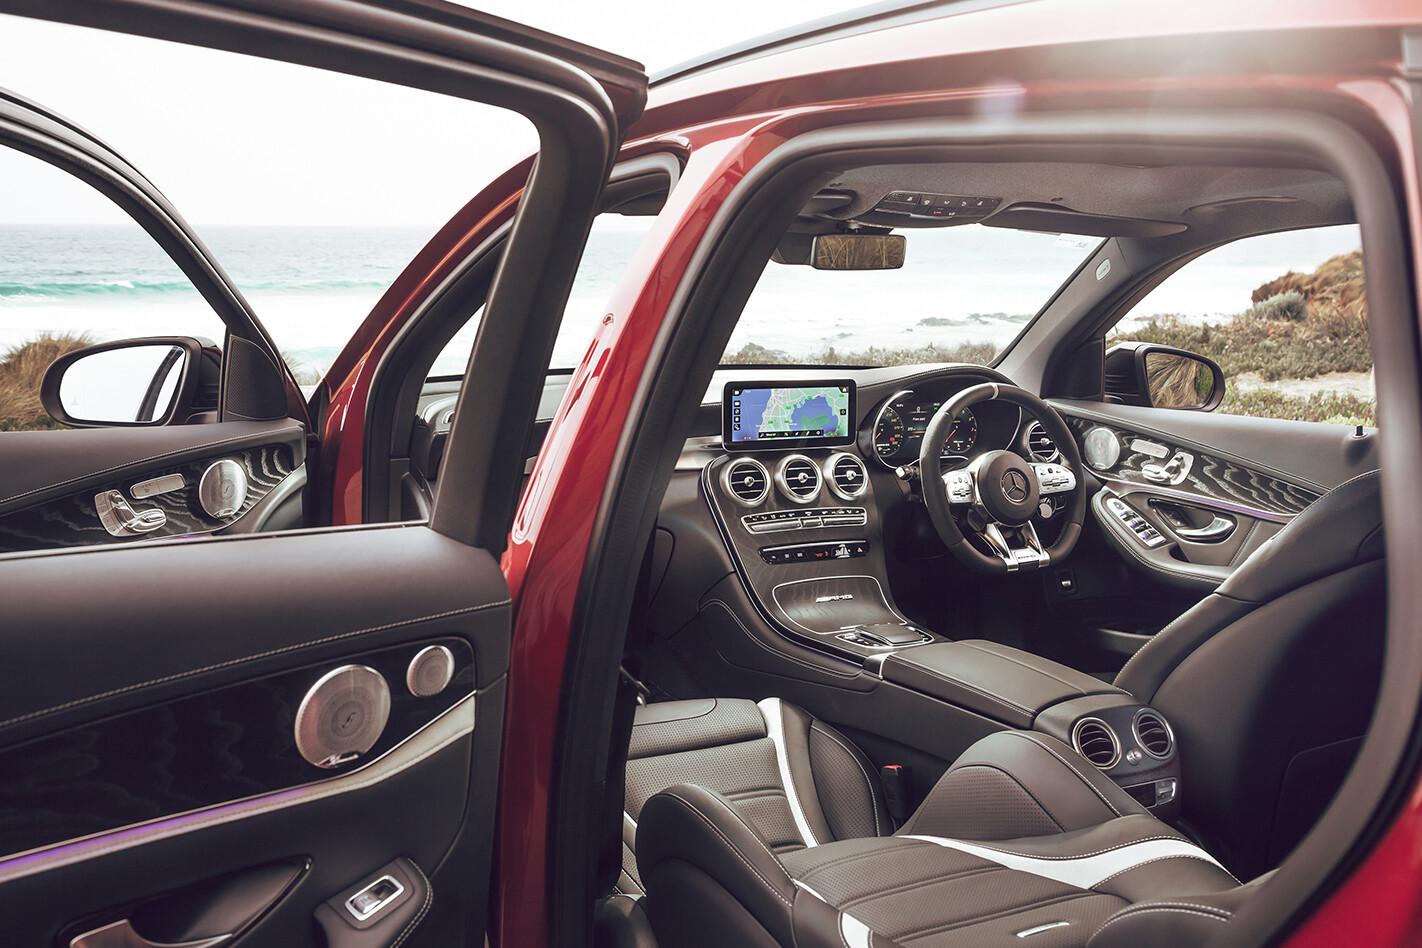 Mercedes AMG GLC 63 S Review Interior Jpg